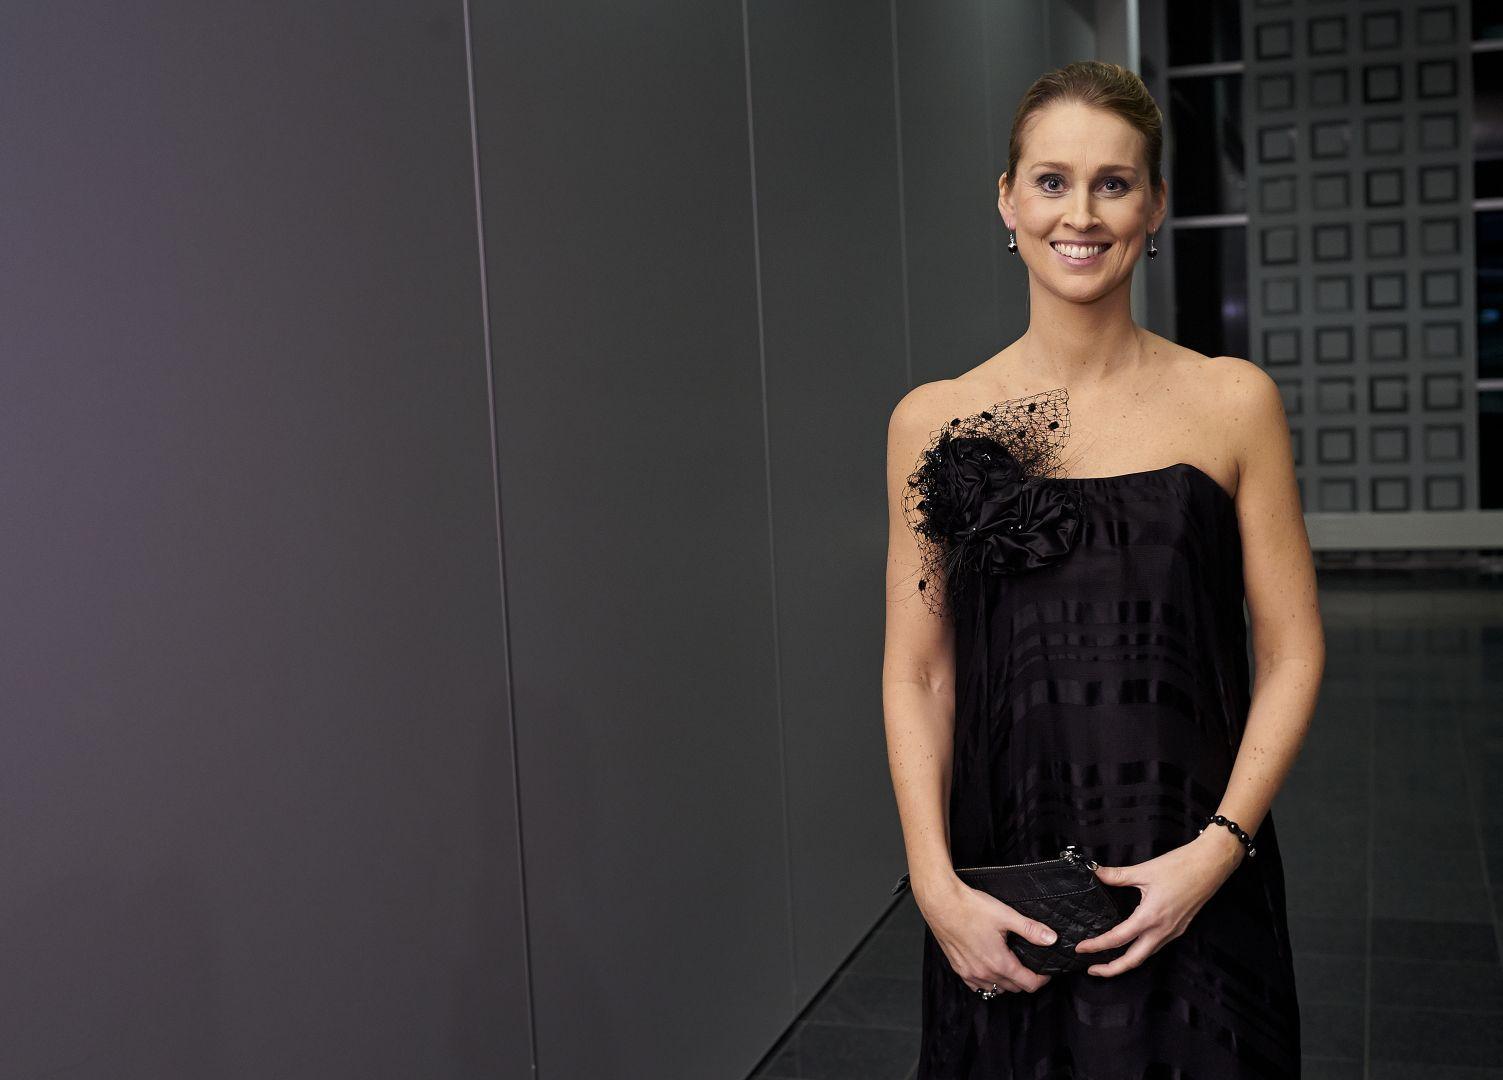 Danmarks mest sexede kvinder   GO' Toshiba Media